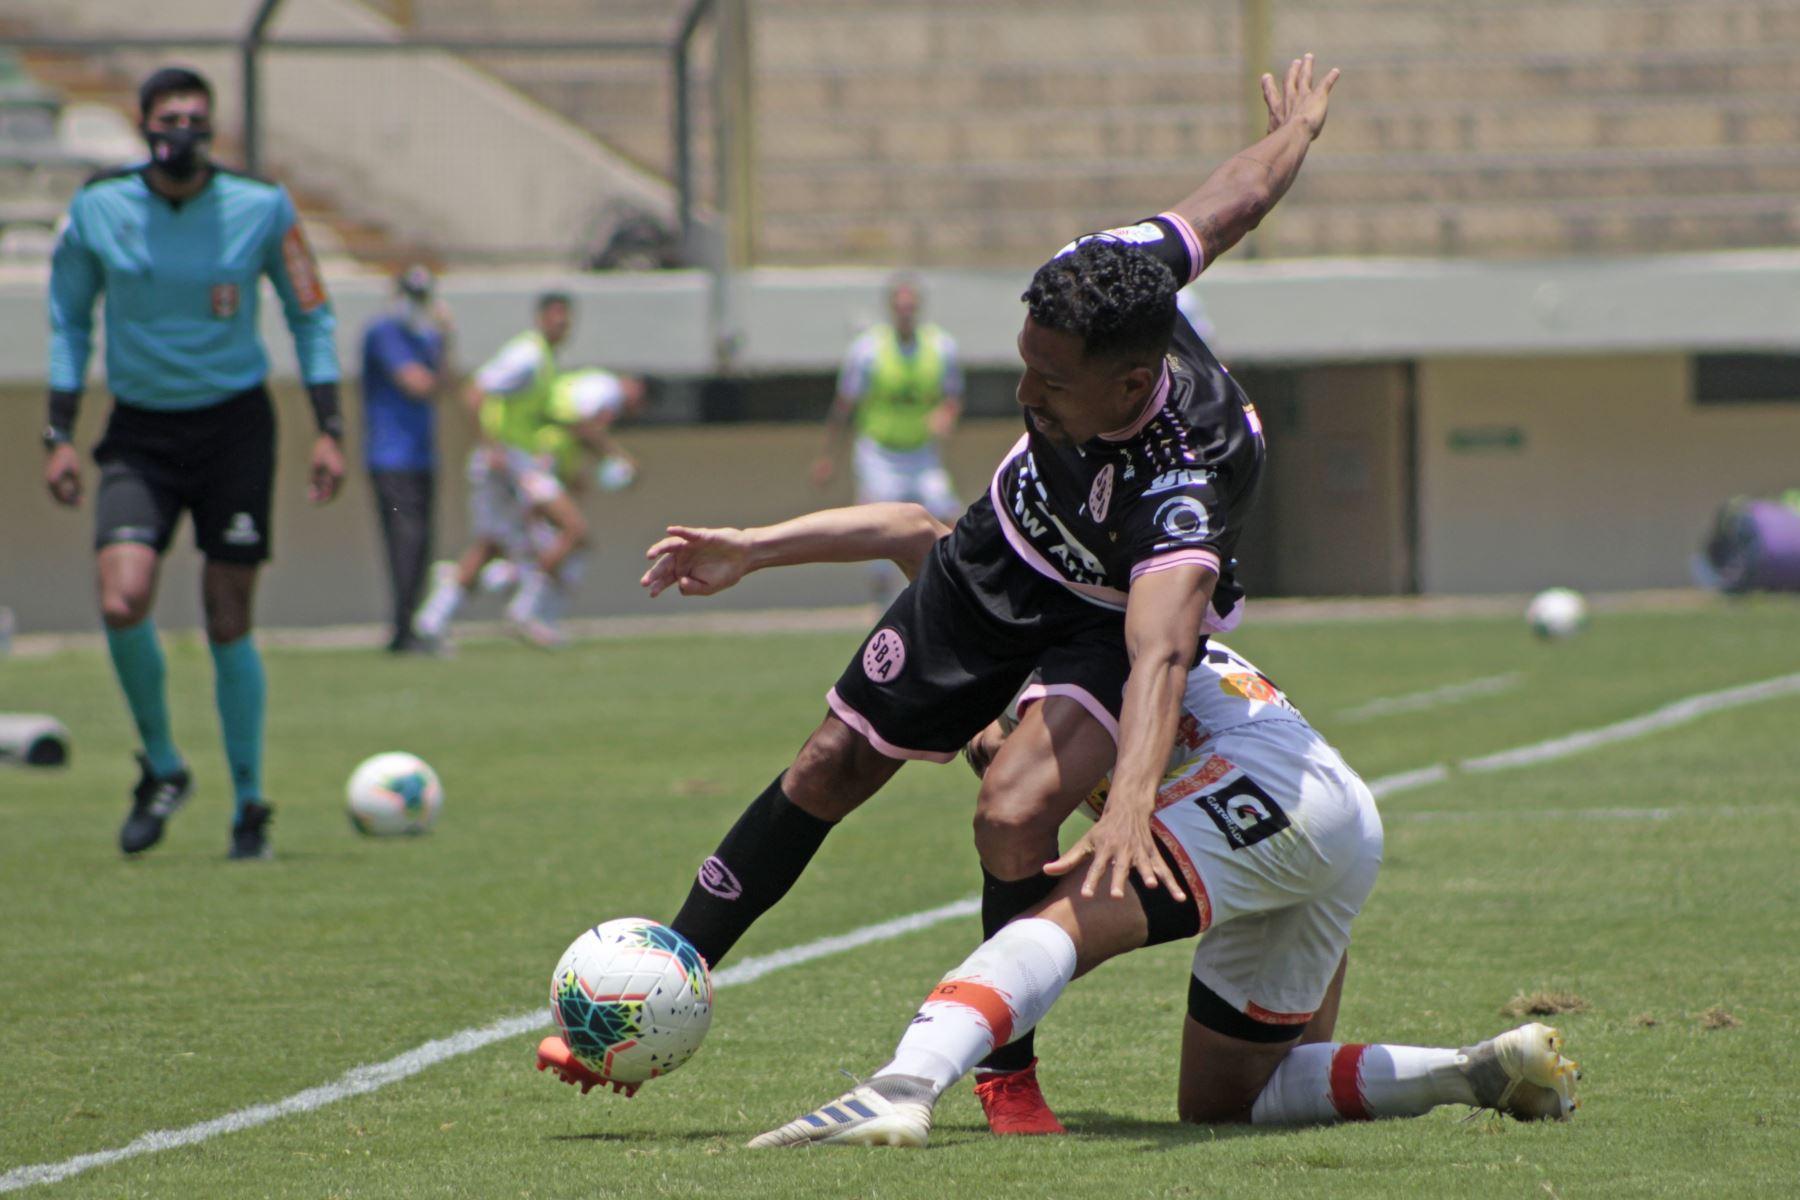 Sport Boys se enfrenta ante Ayacucho FC por la octava jornada de la fase 2, en el Estadio Monumental. Foto: Liga 1